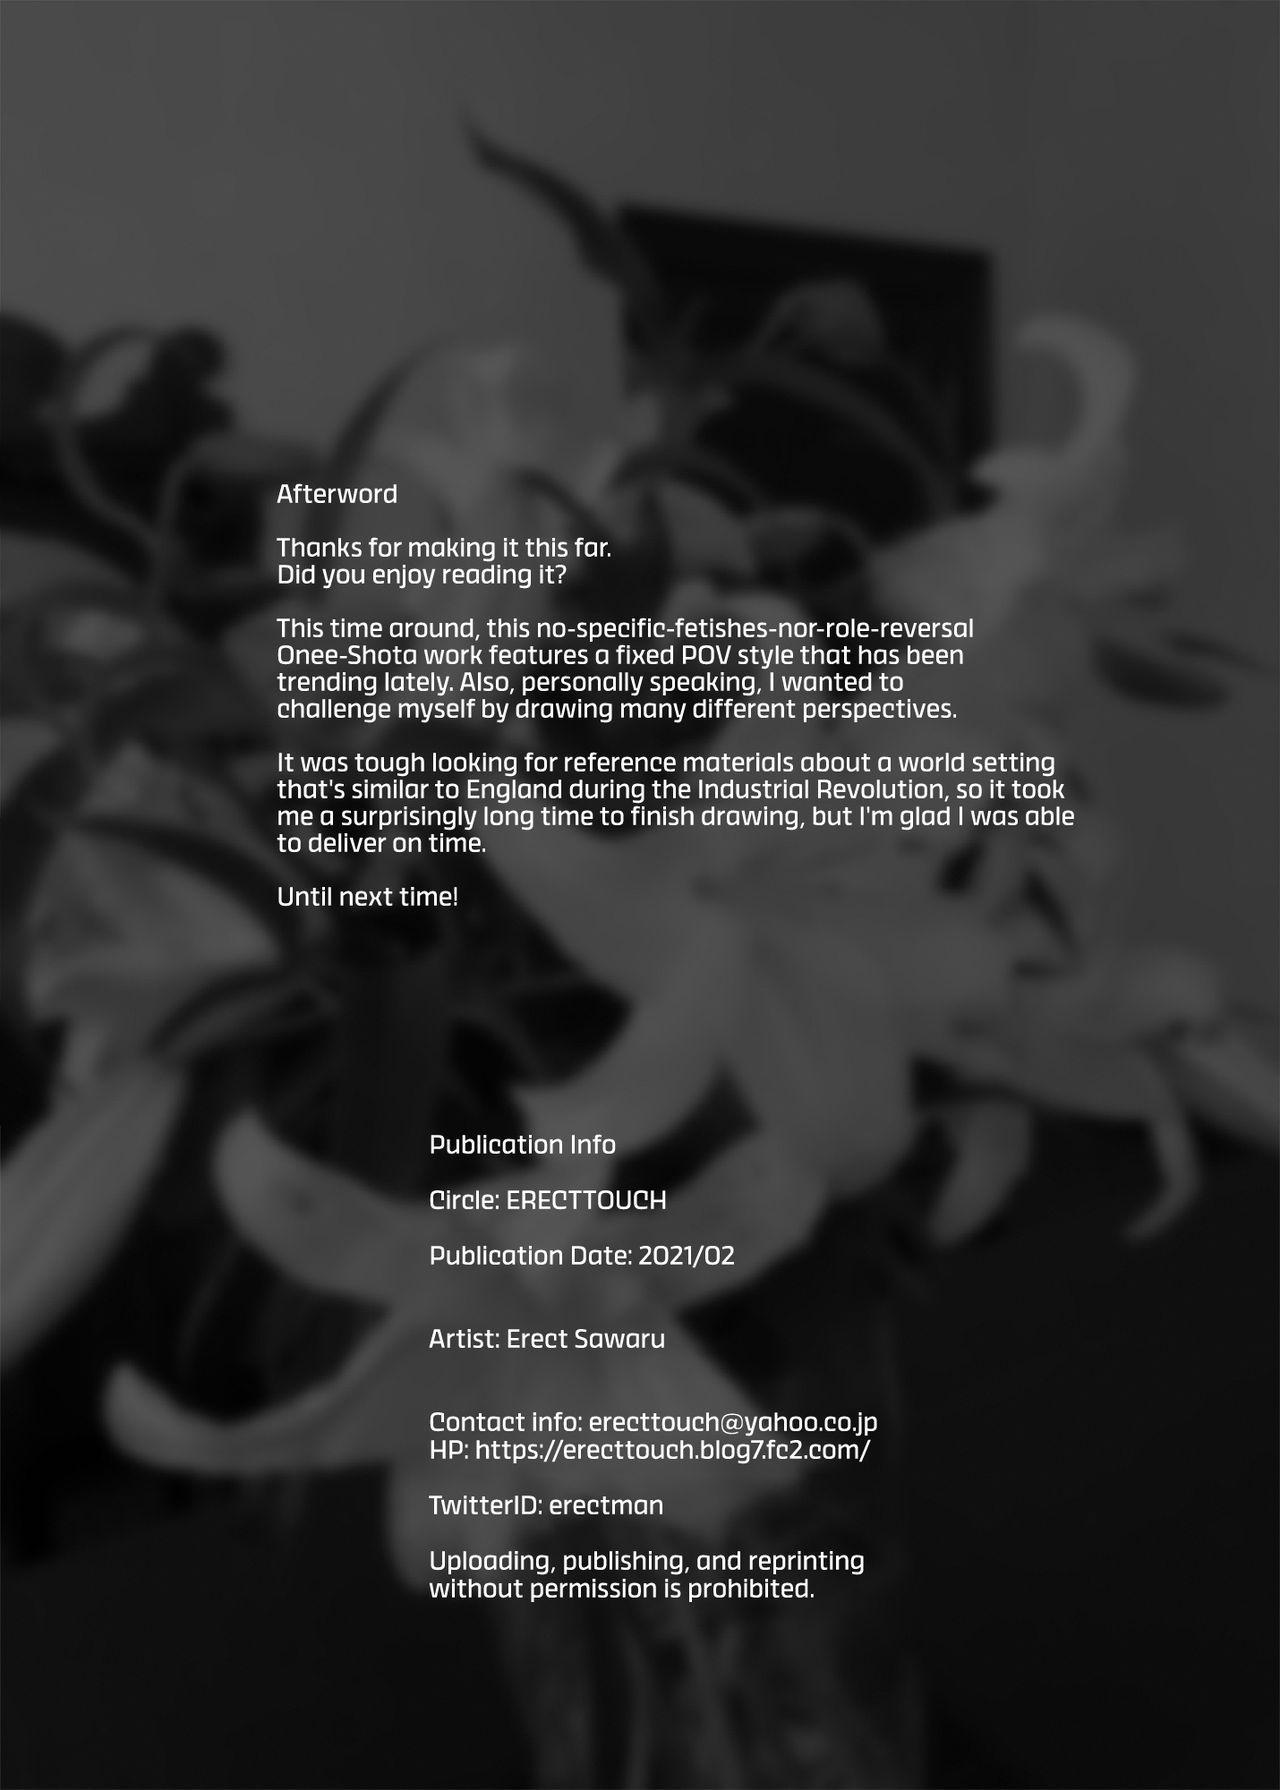 [ERECT TOUCH (Erect Sawaru)] Flower Vendor ~Hanauri Onee-san ni Yasashiku Fudeoroshi~ | Flower Vendor ~Gently Losing My Virginity To Miss Flower Vendor~ [English] [RedLantern] 40